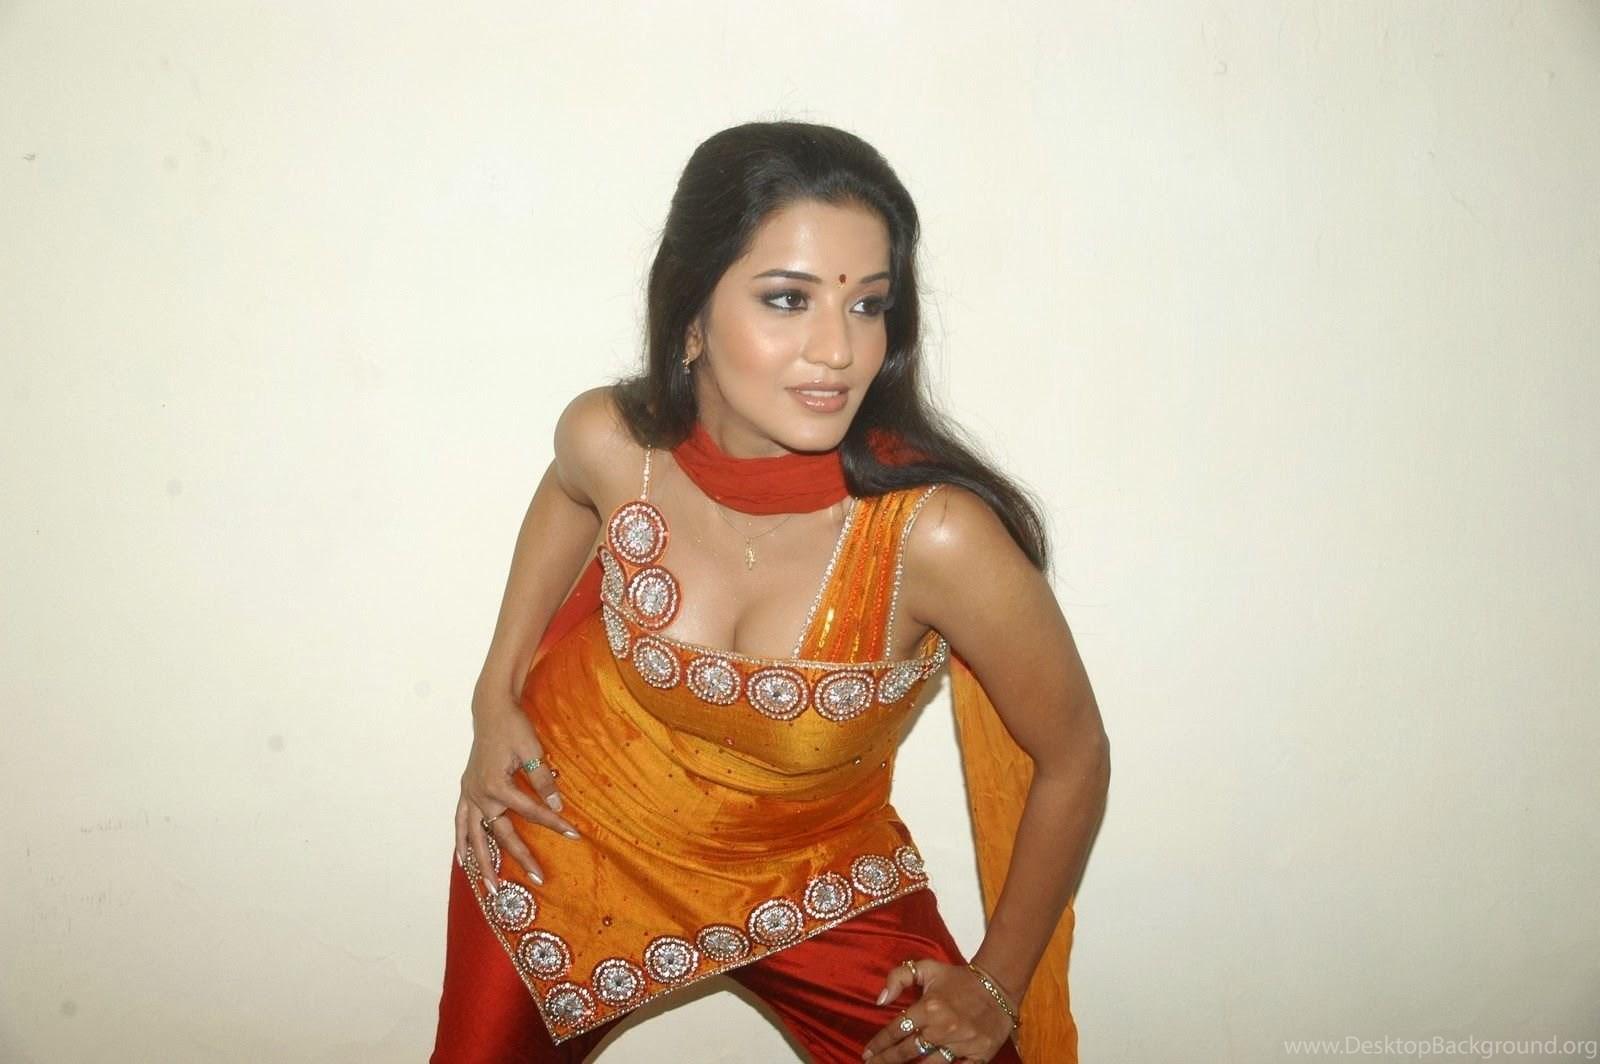 Hot Bhojpuri Actress Monalisa Photos Gallery Bhojpuri Actress